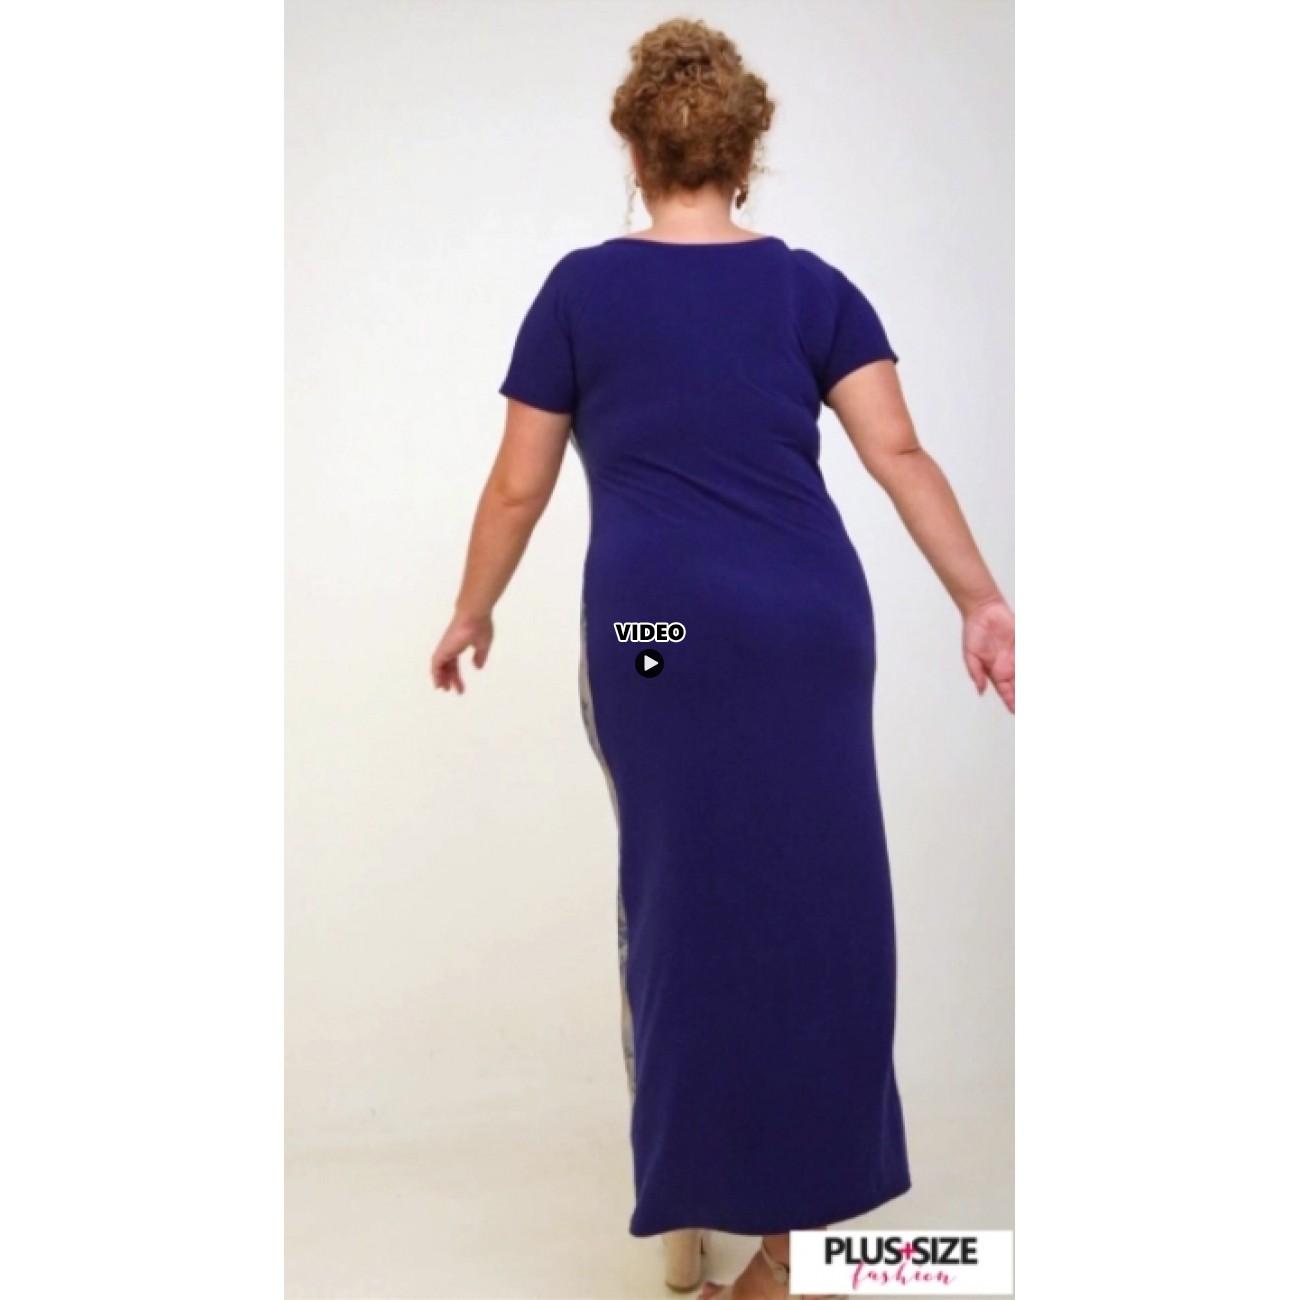 A21-8723FK Long Jersey Dress with pattern